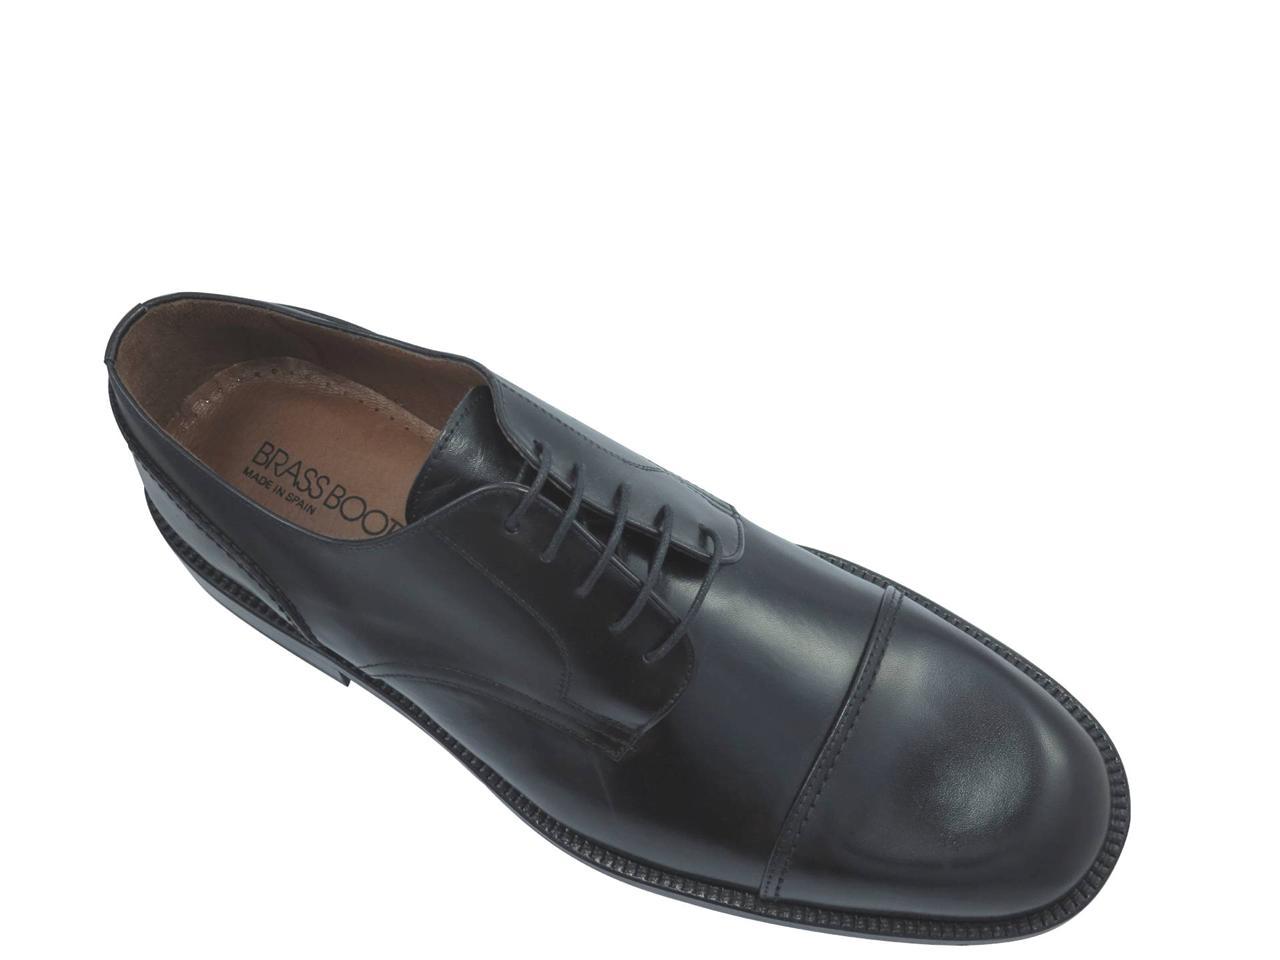 Brass Boot Seville Menu0026#39;s Lace Up Shoes Black | EBay